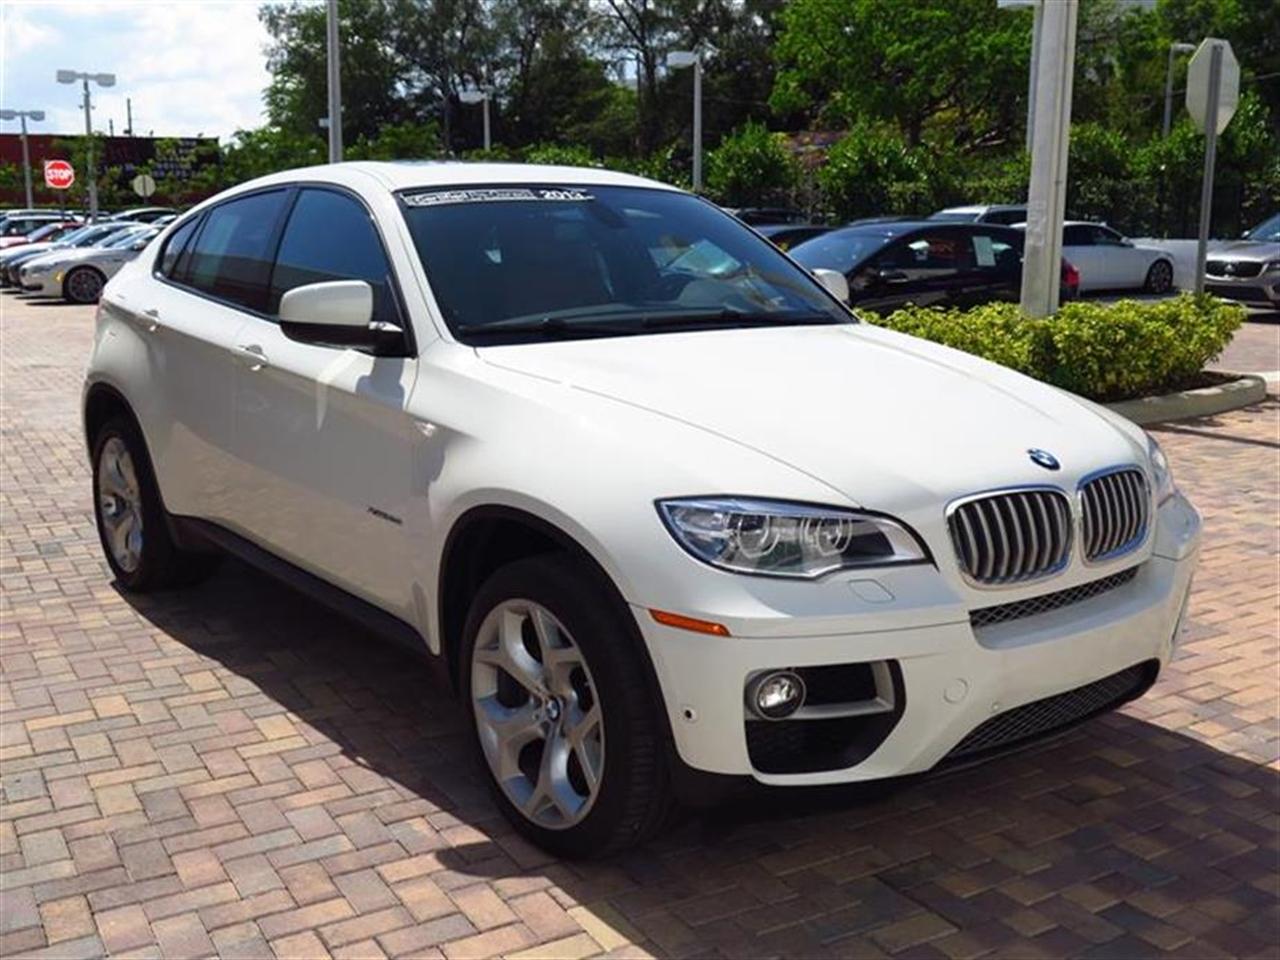 2013 BMW X6 AWD 4dr xDrive50i 30324 miles 20-way power multi-contour front bucket seats -inc sta